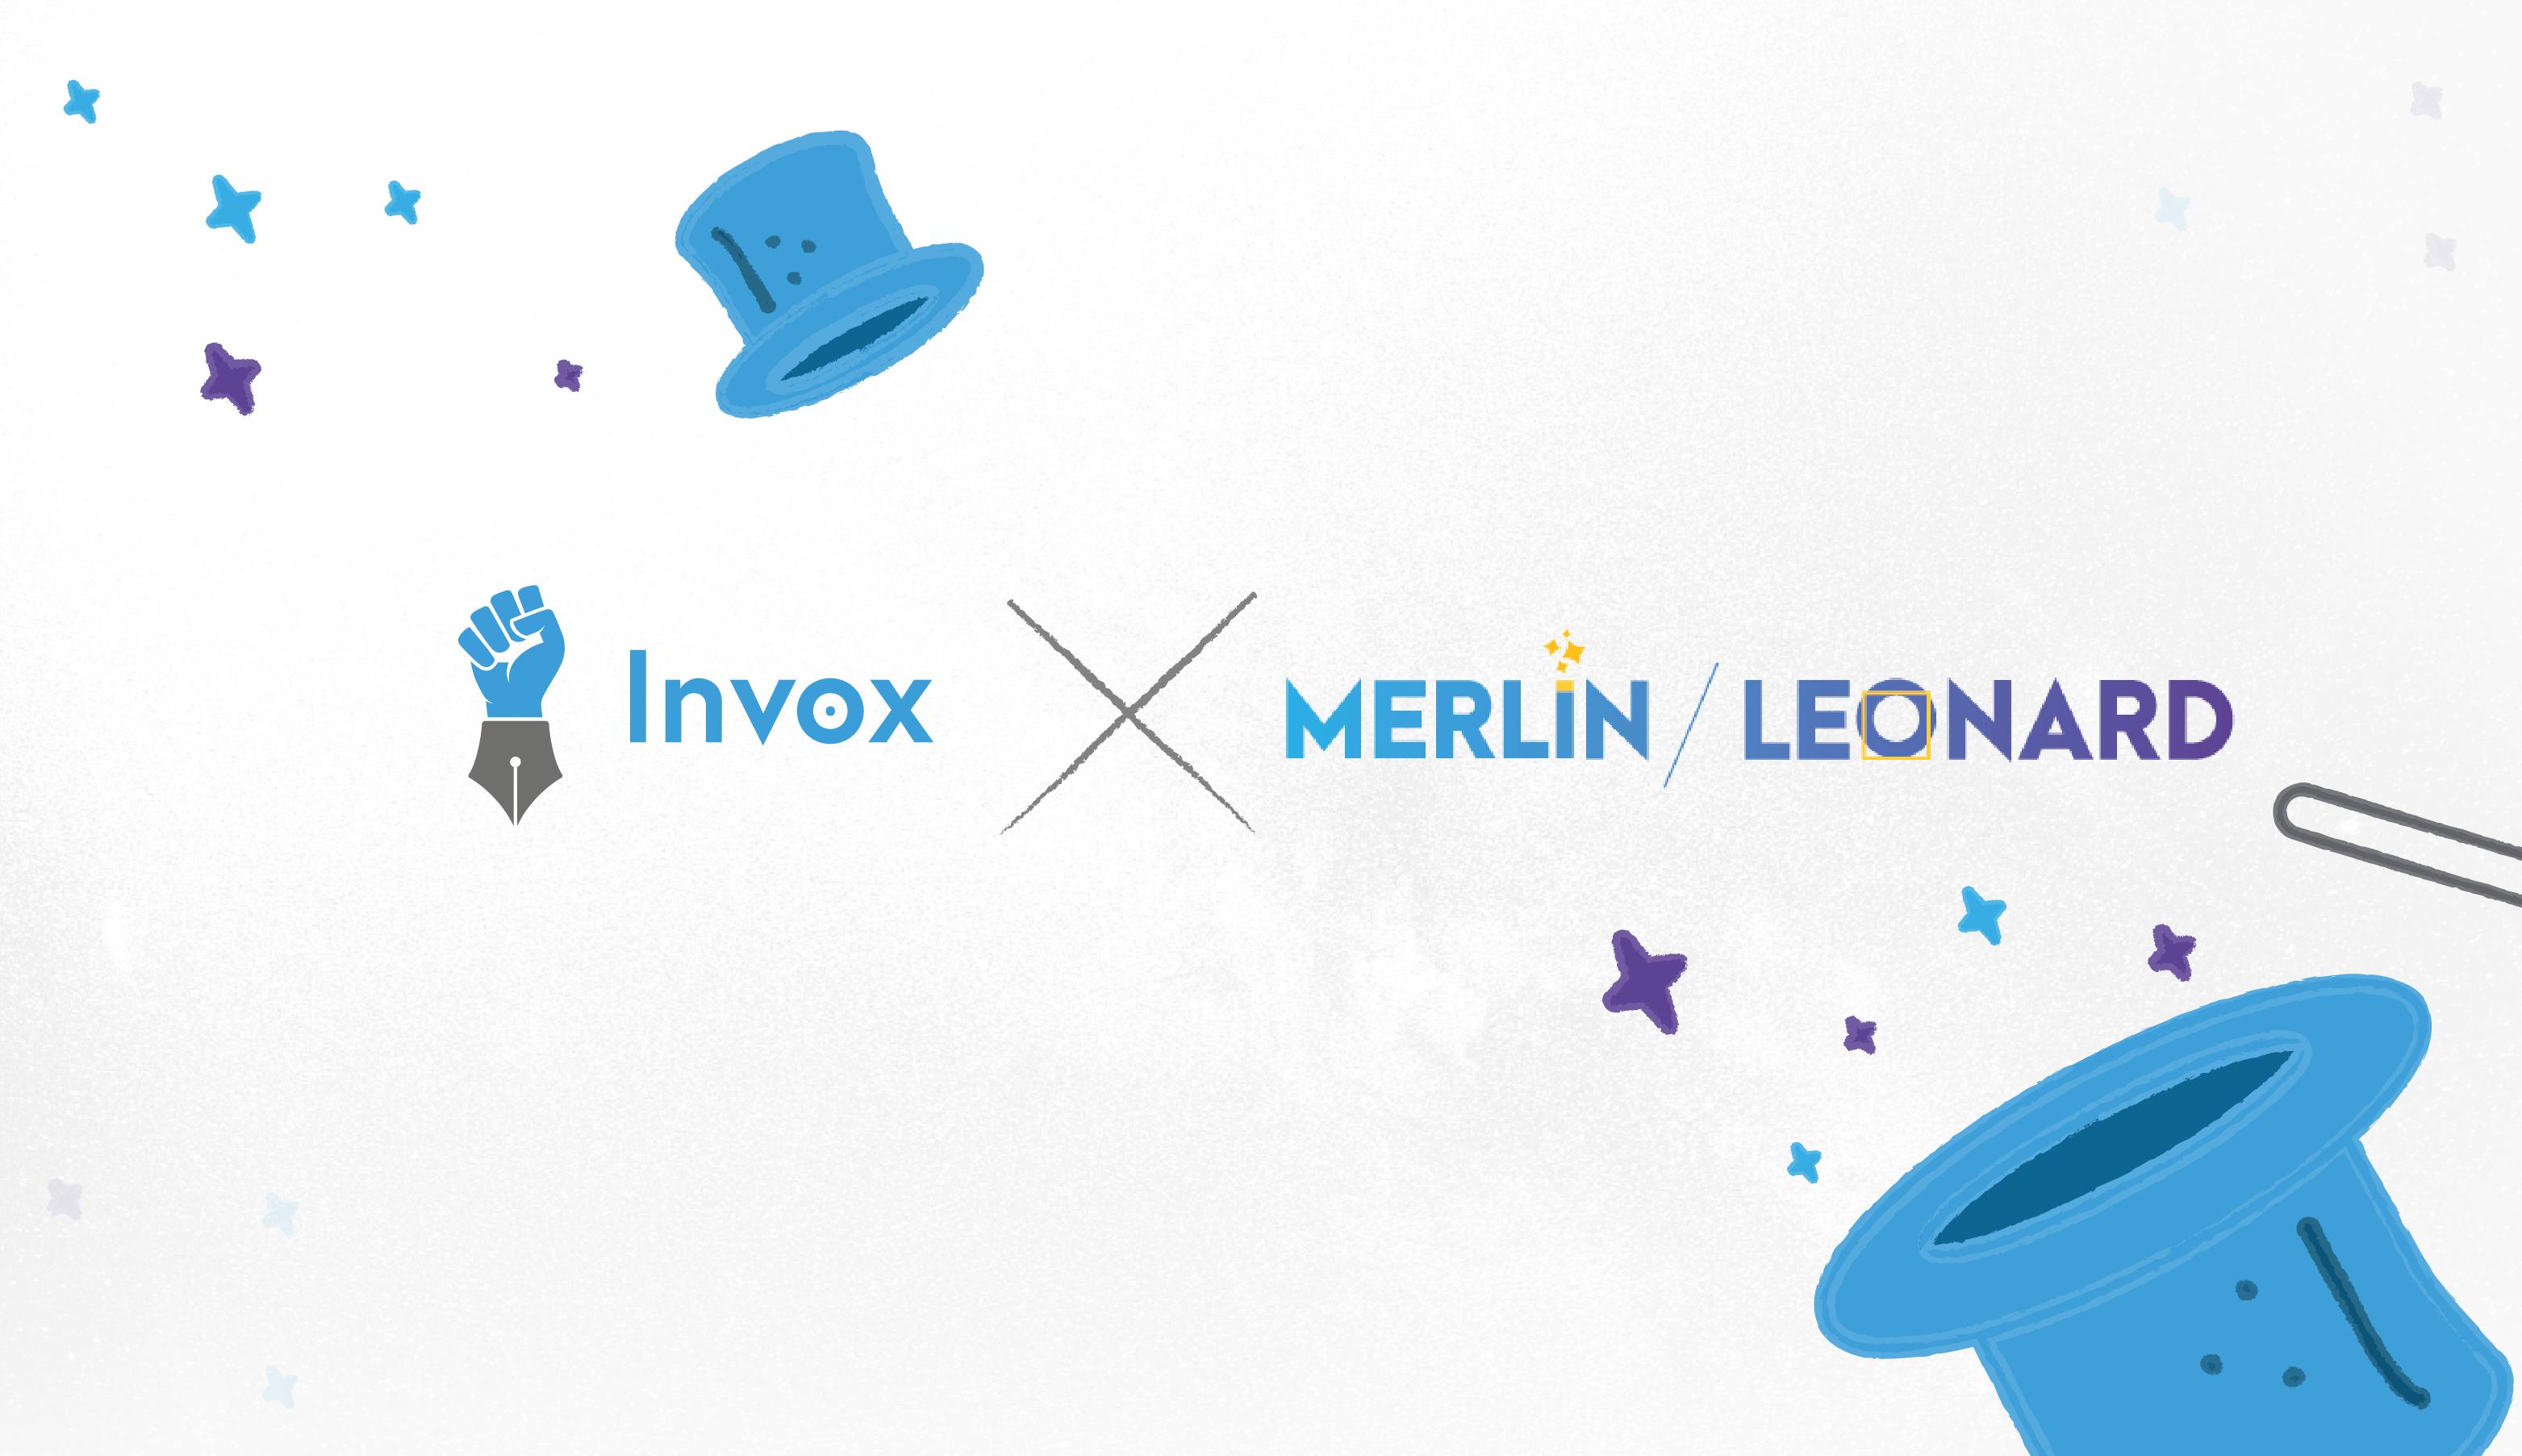 invox + Merlin/Leonard